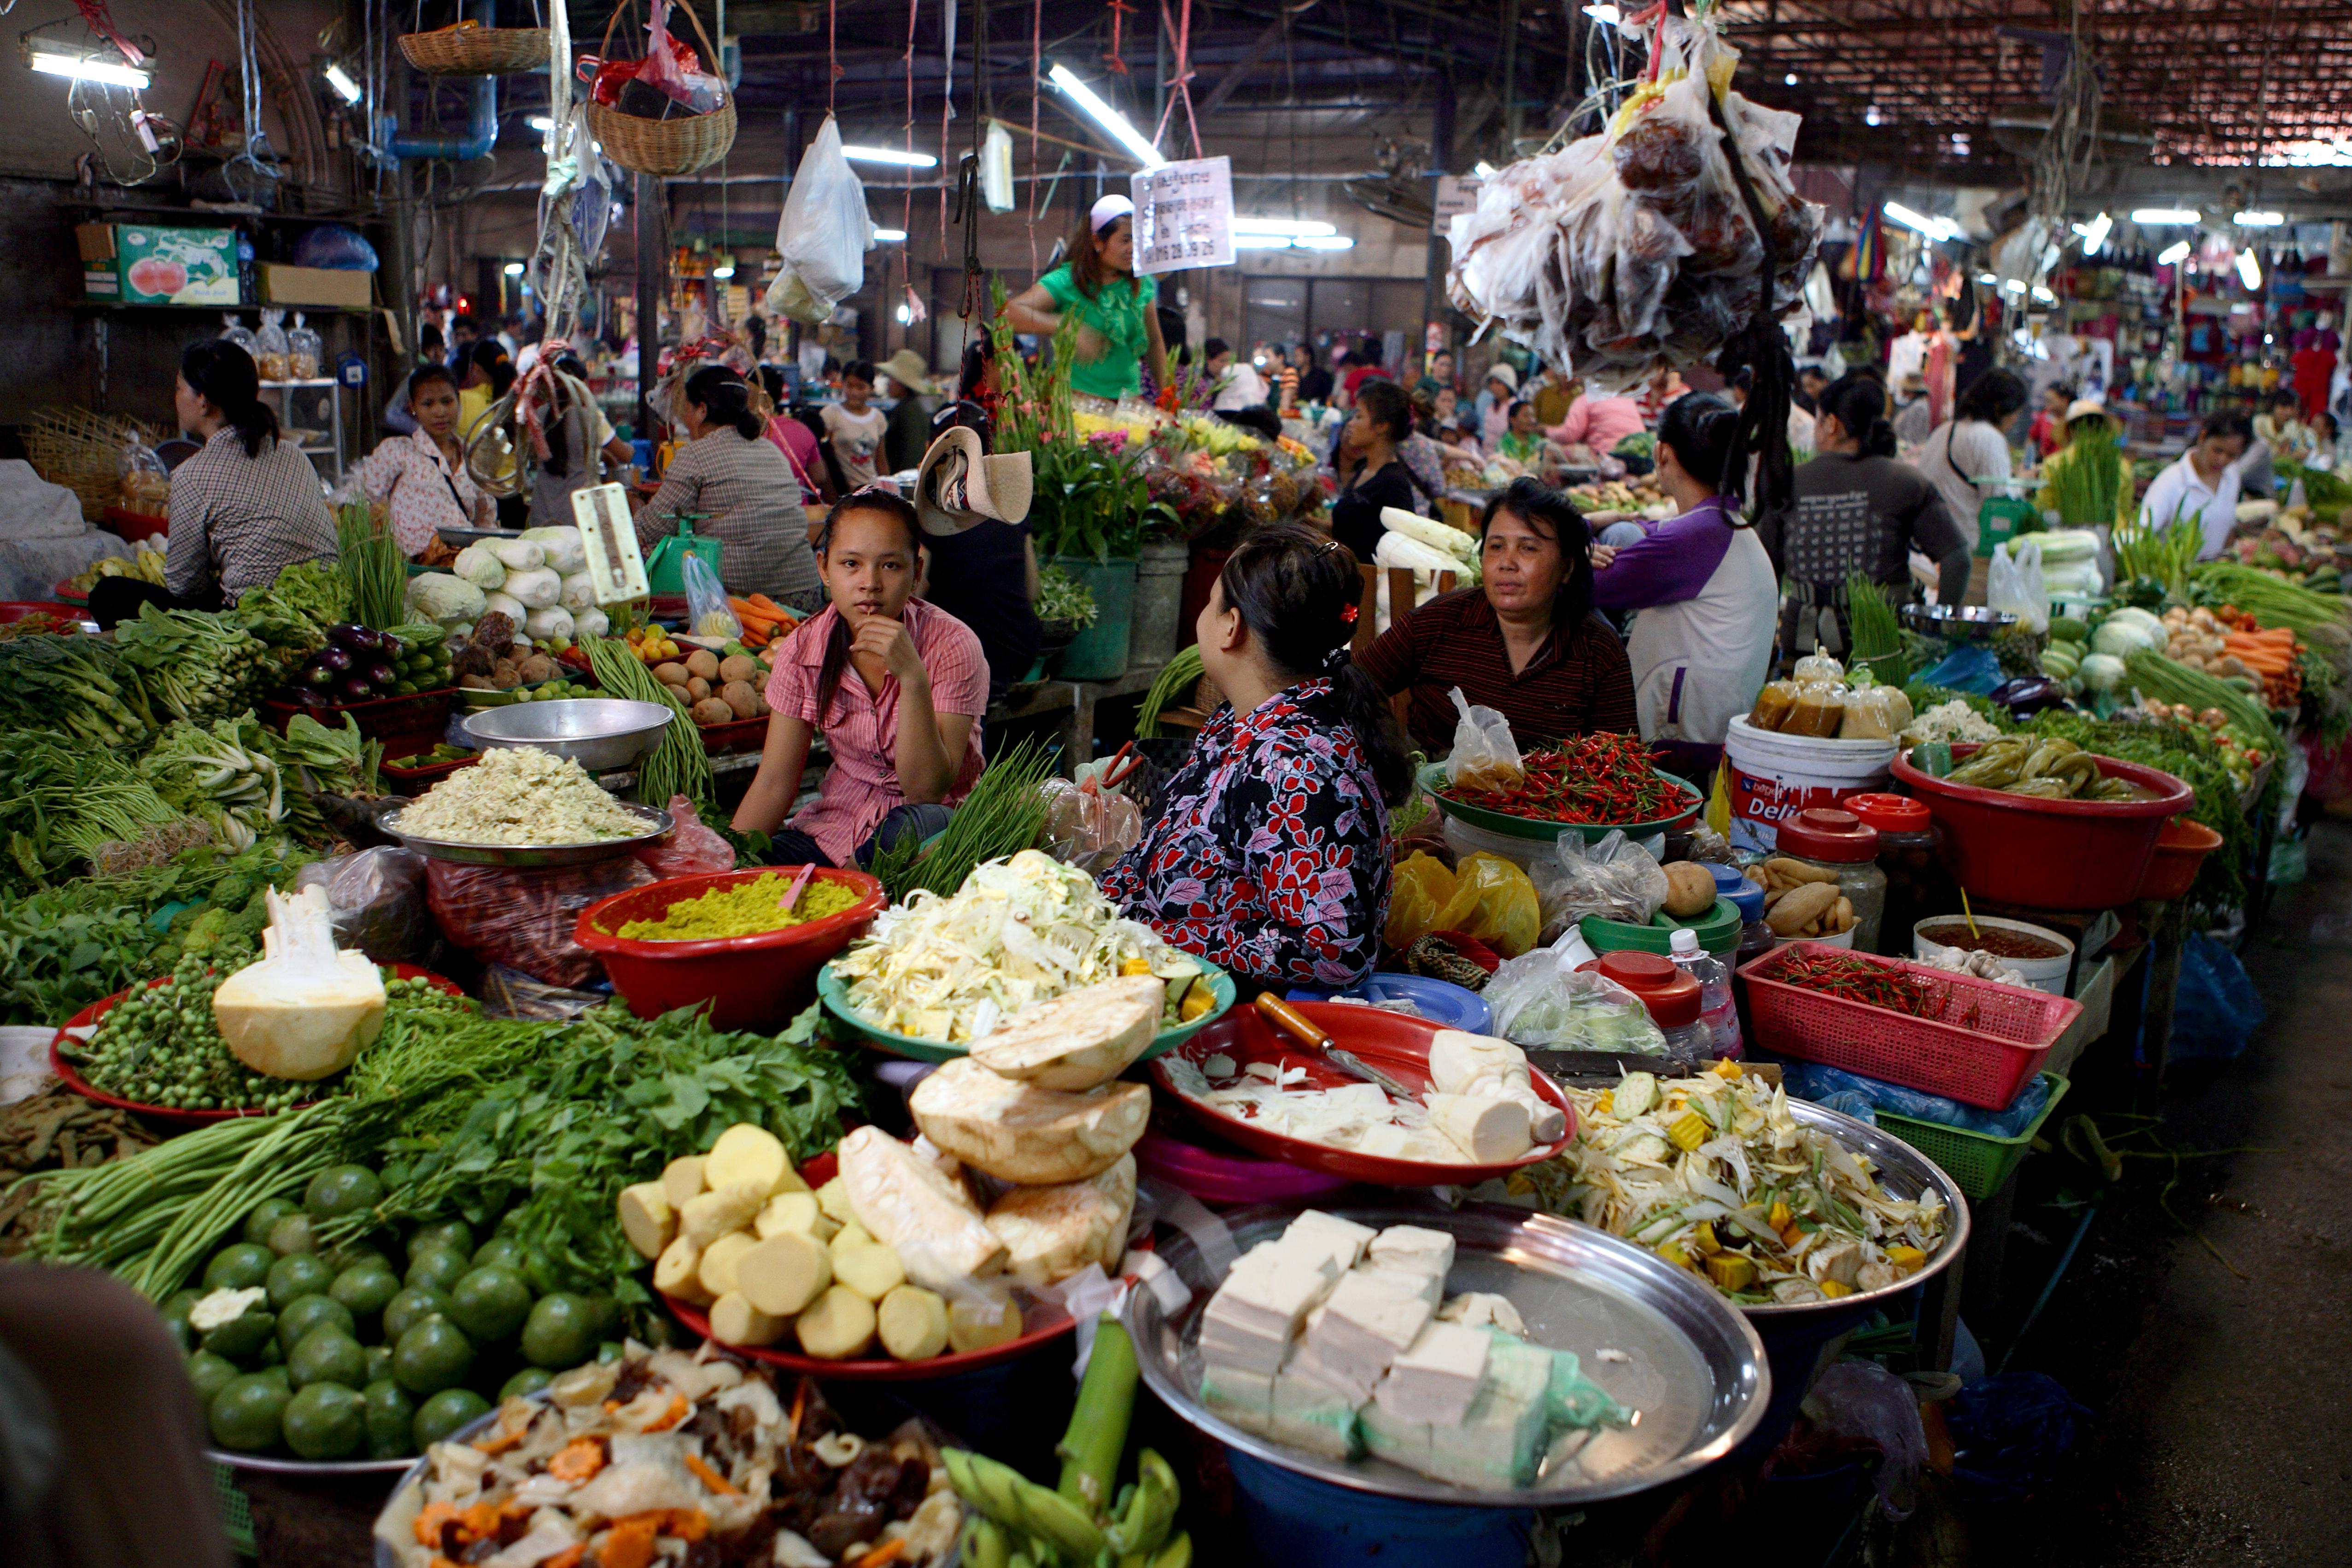 Markt in Siem Reap, Kambodscha, Djoser Reisen